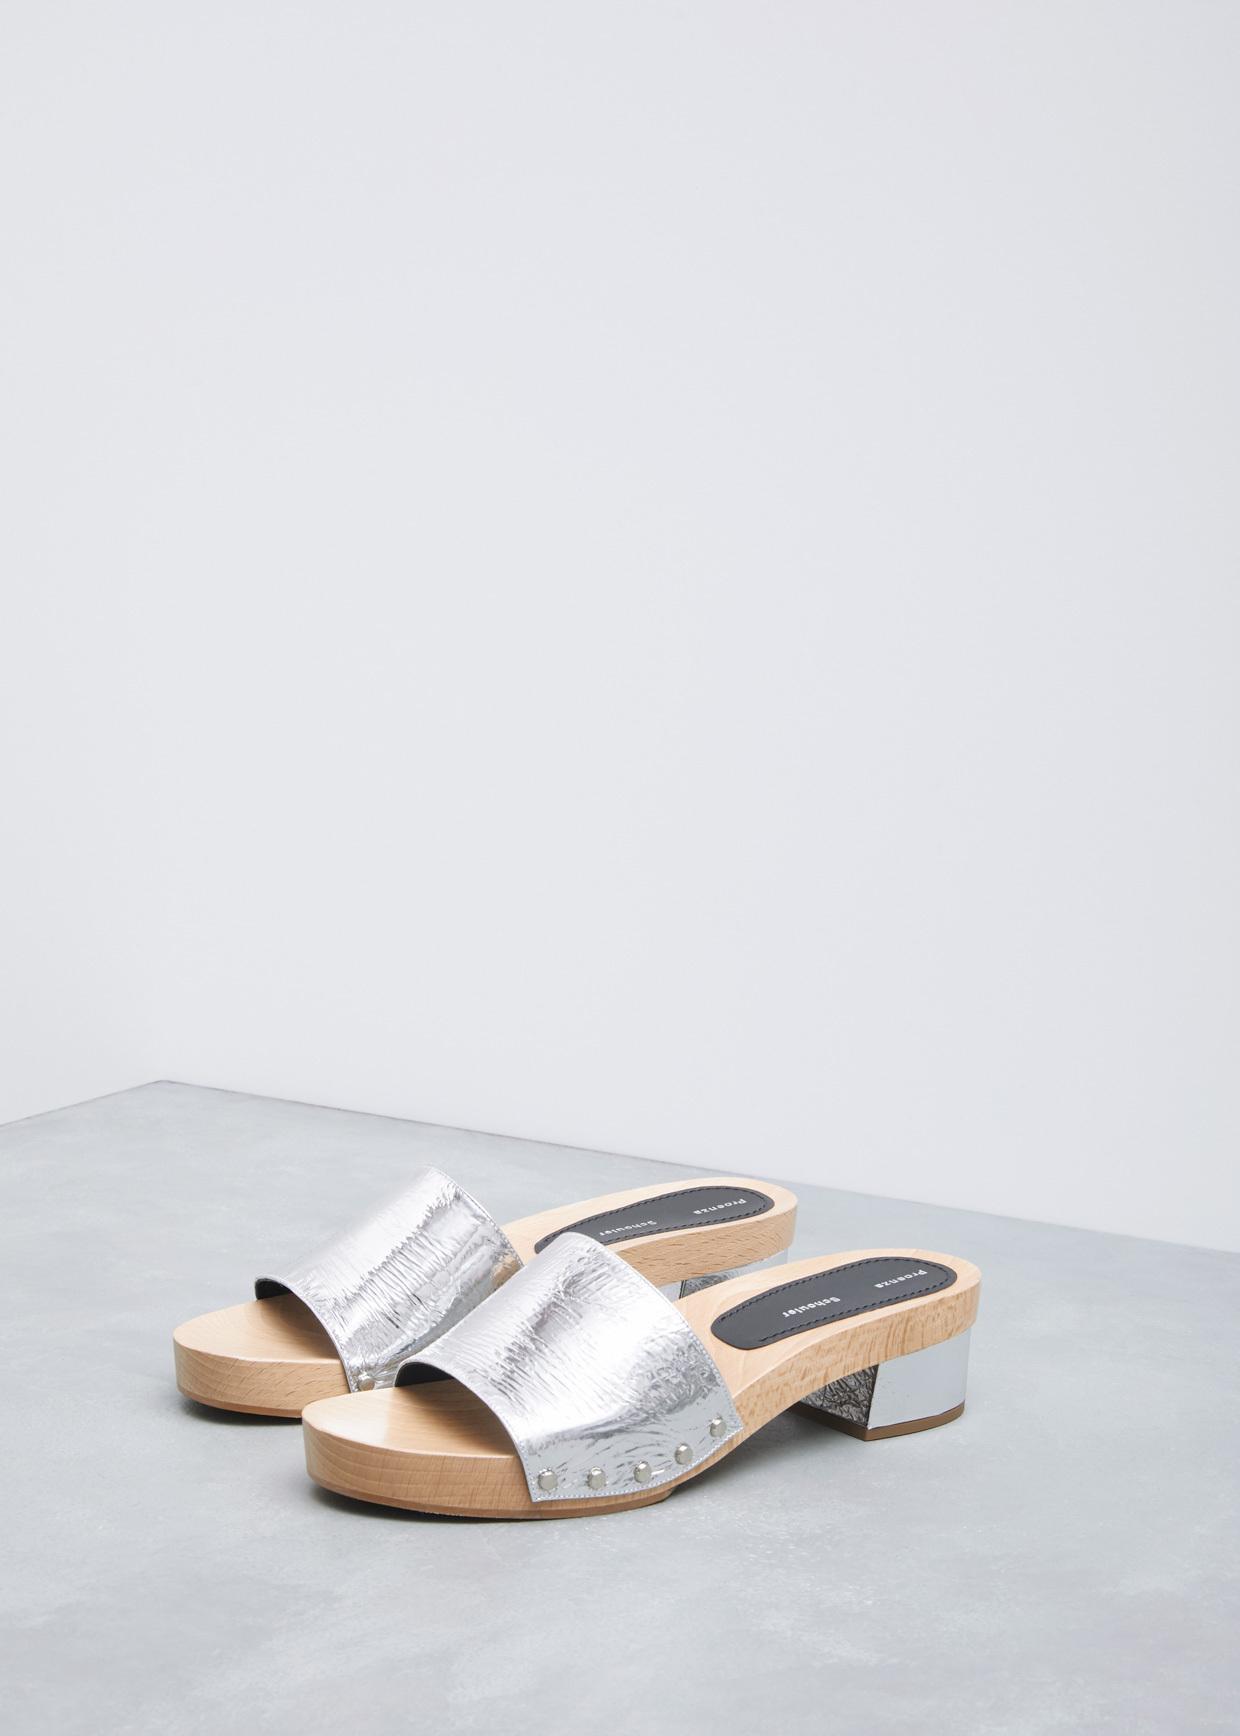 d83726c68d3 Lyst - Proenza Schouler Silver Metallic Simple Slide Wedge Sandal in ...